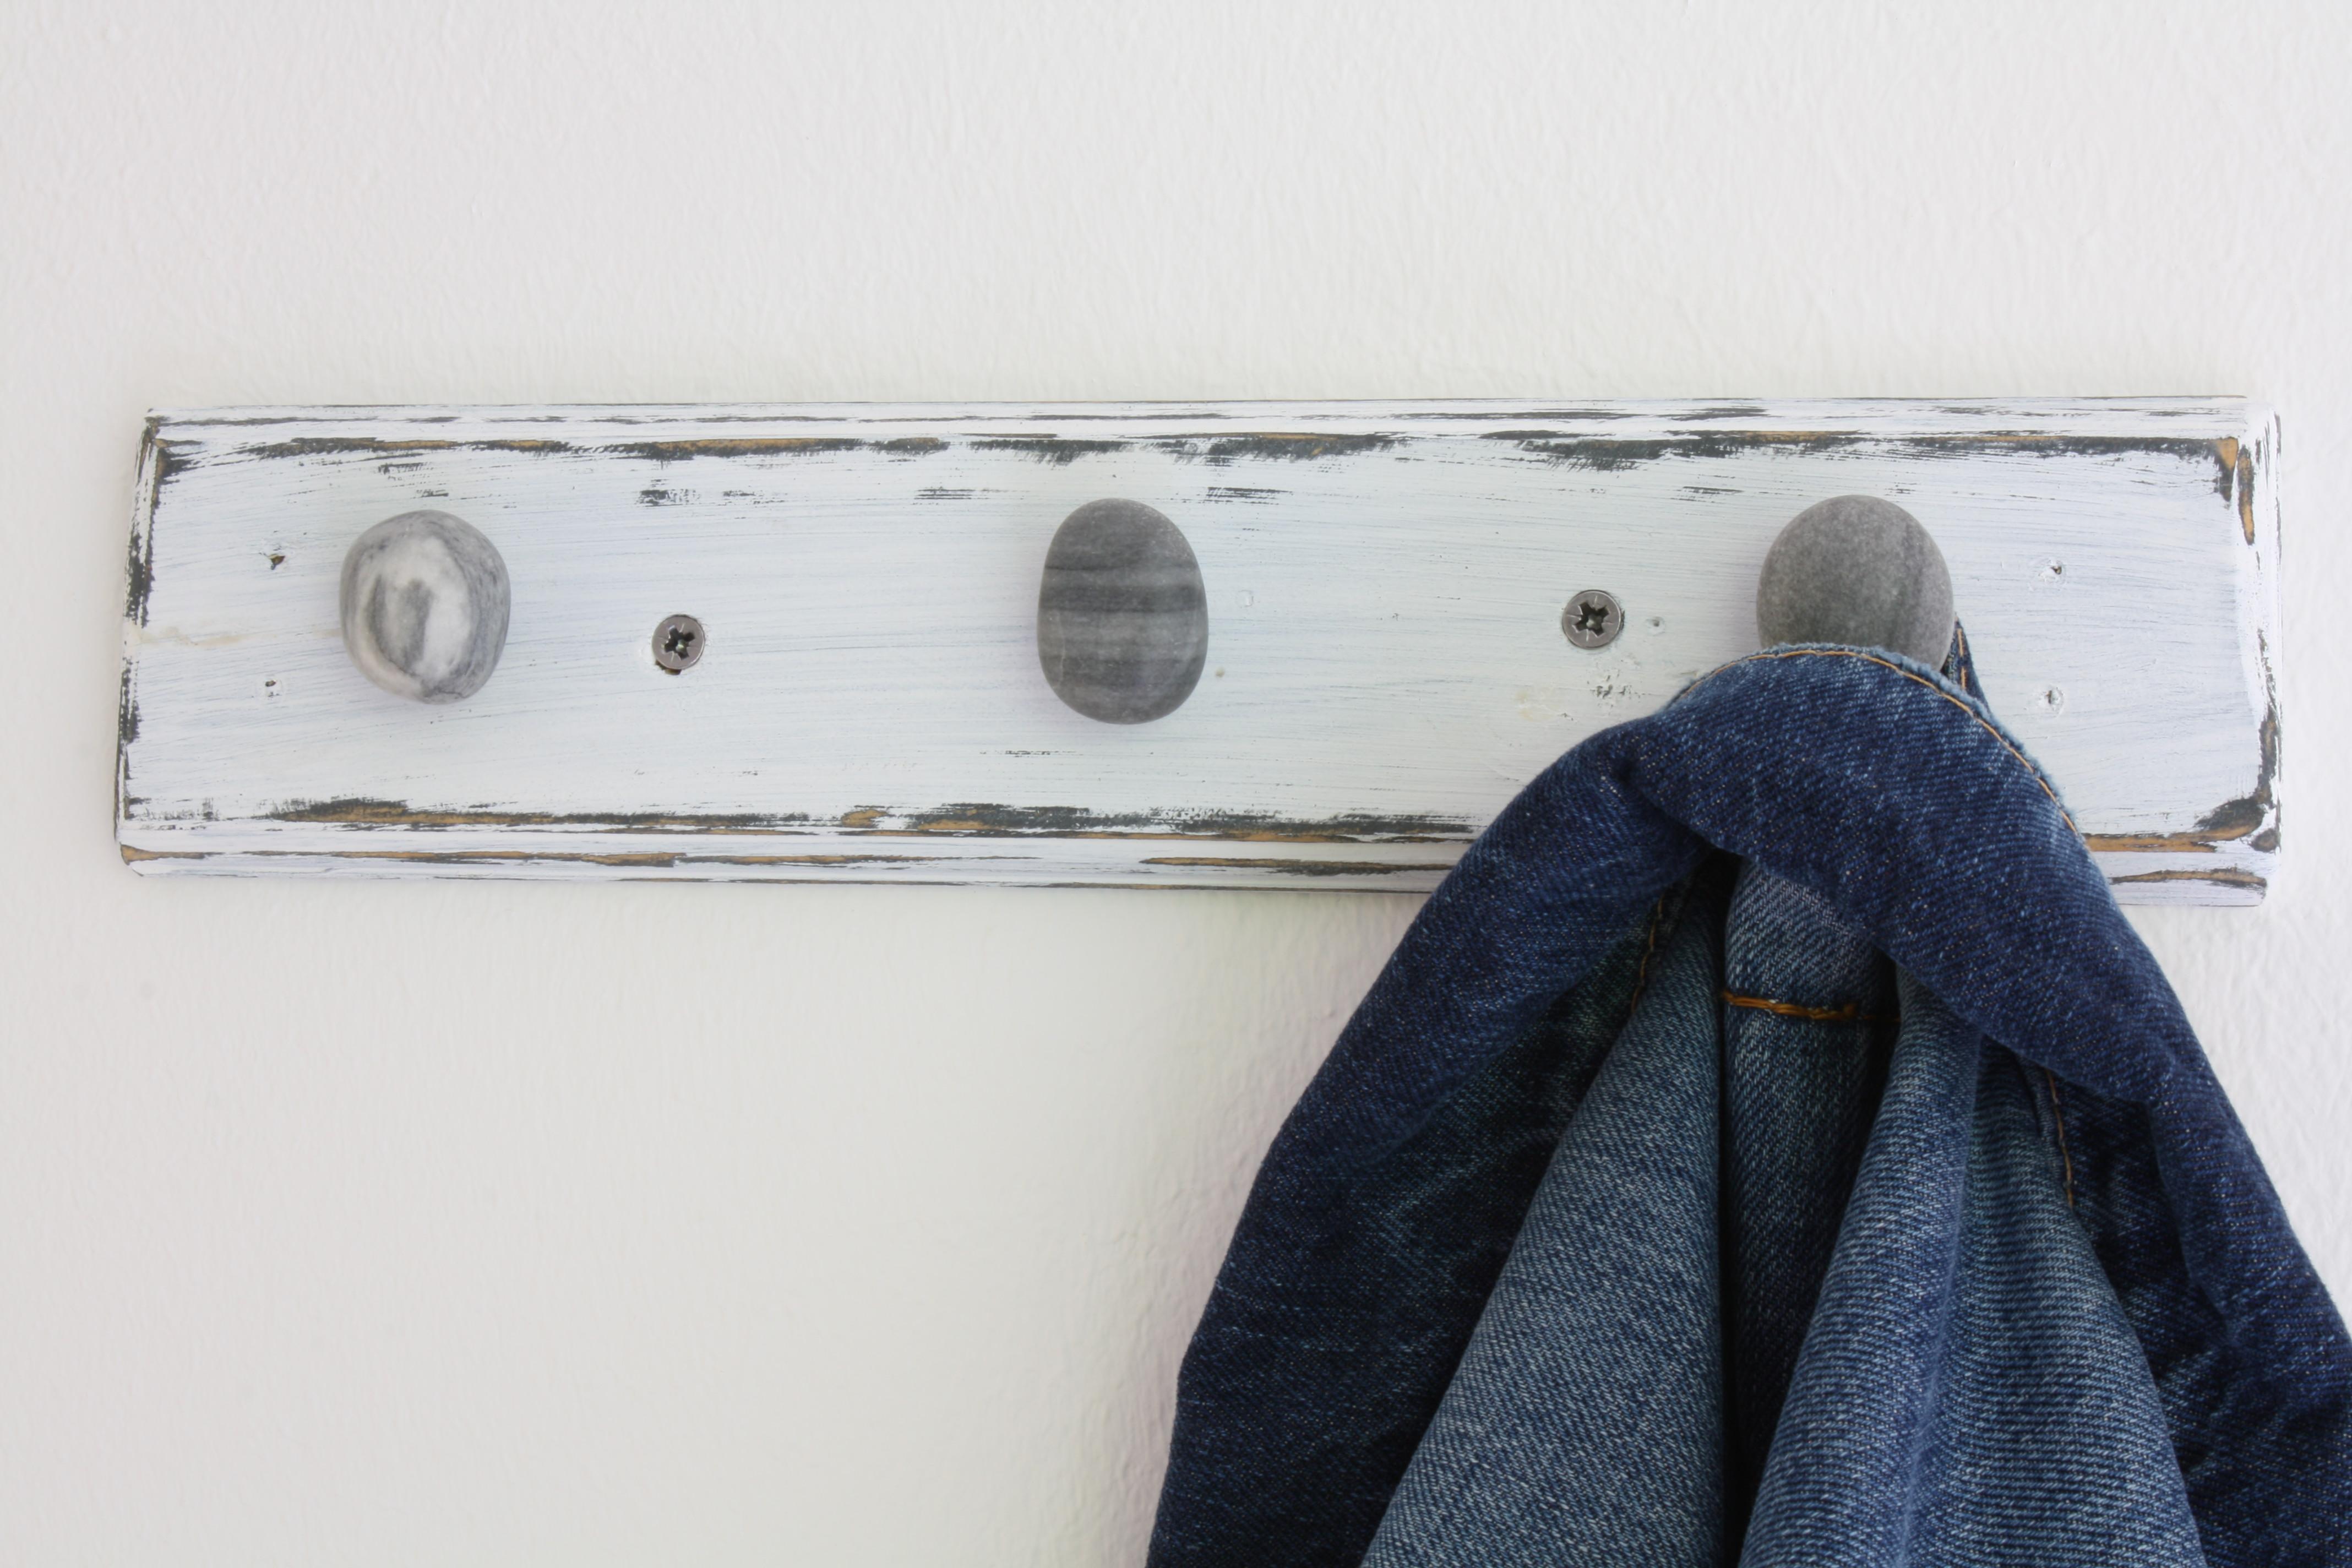 garderobe mit sch nen kieselkn ufen kieselschmuck. Black Bedroom Furniture Sets. Home Design Ideas